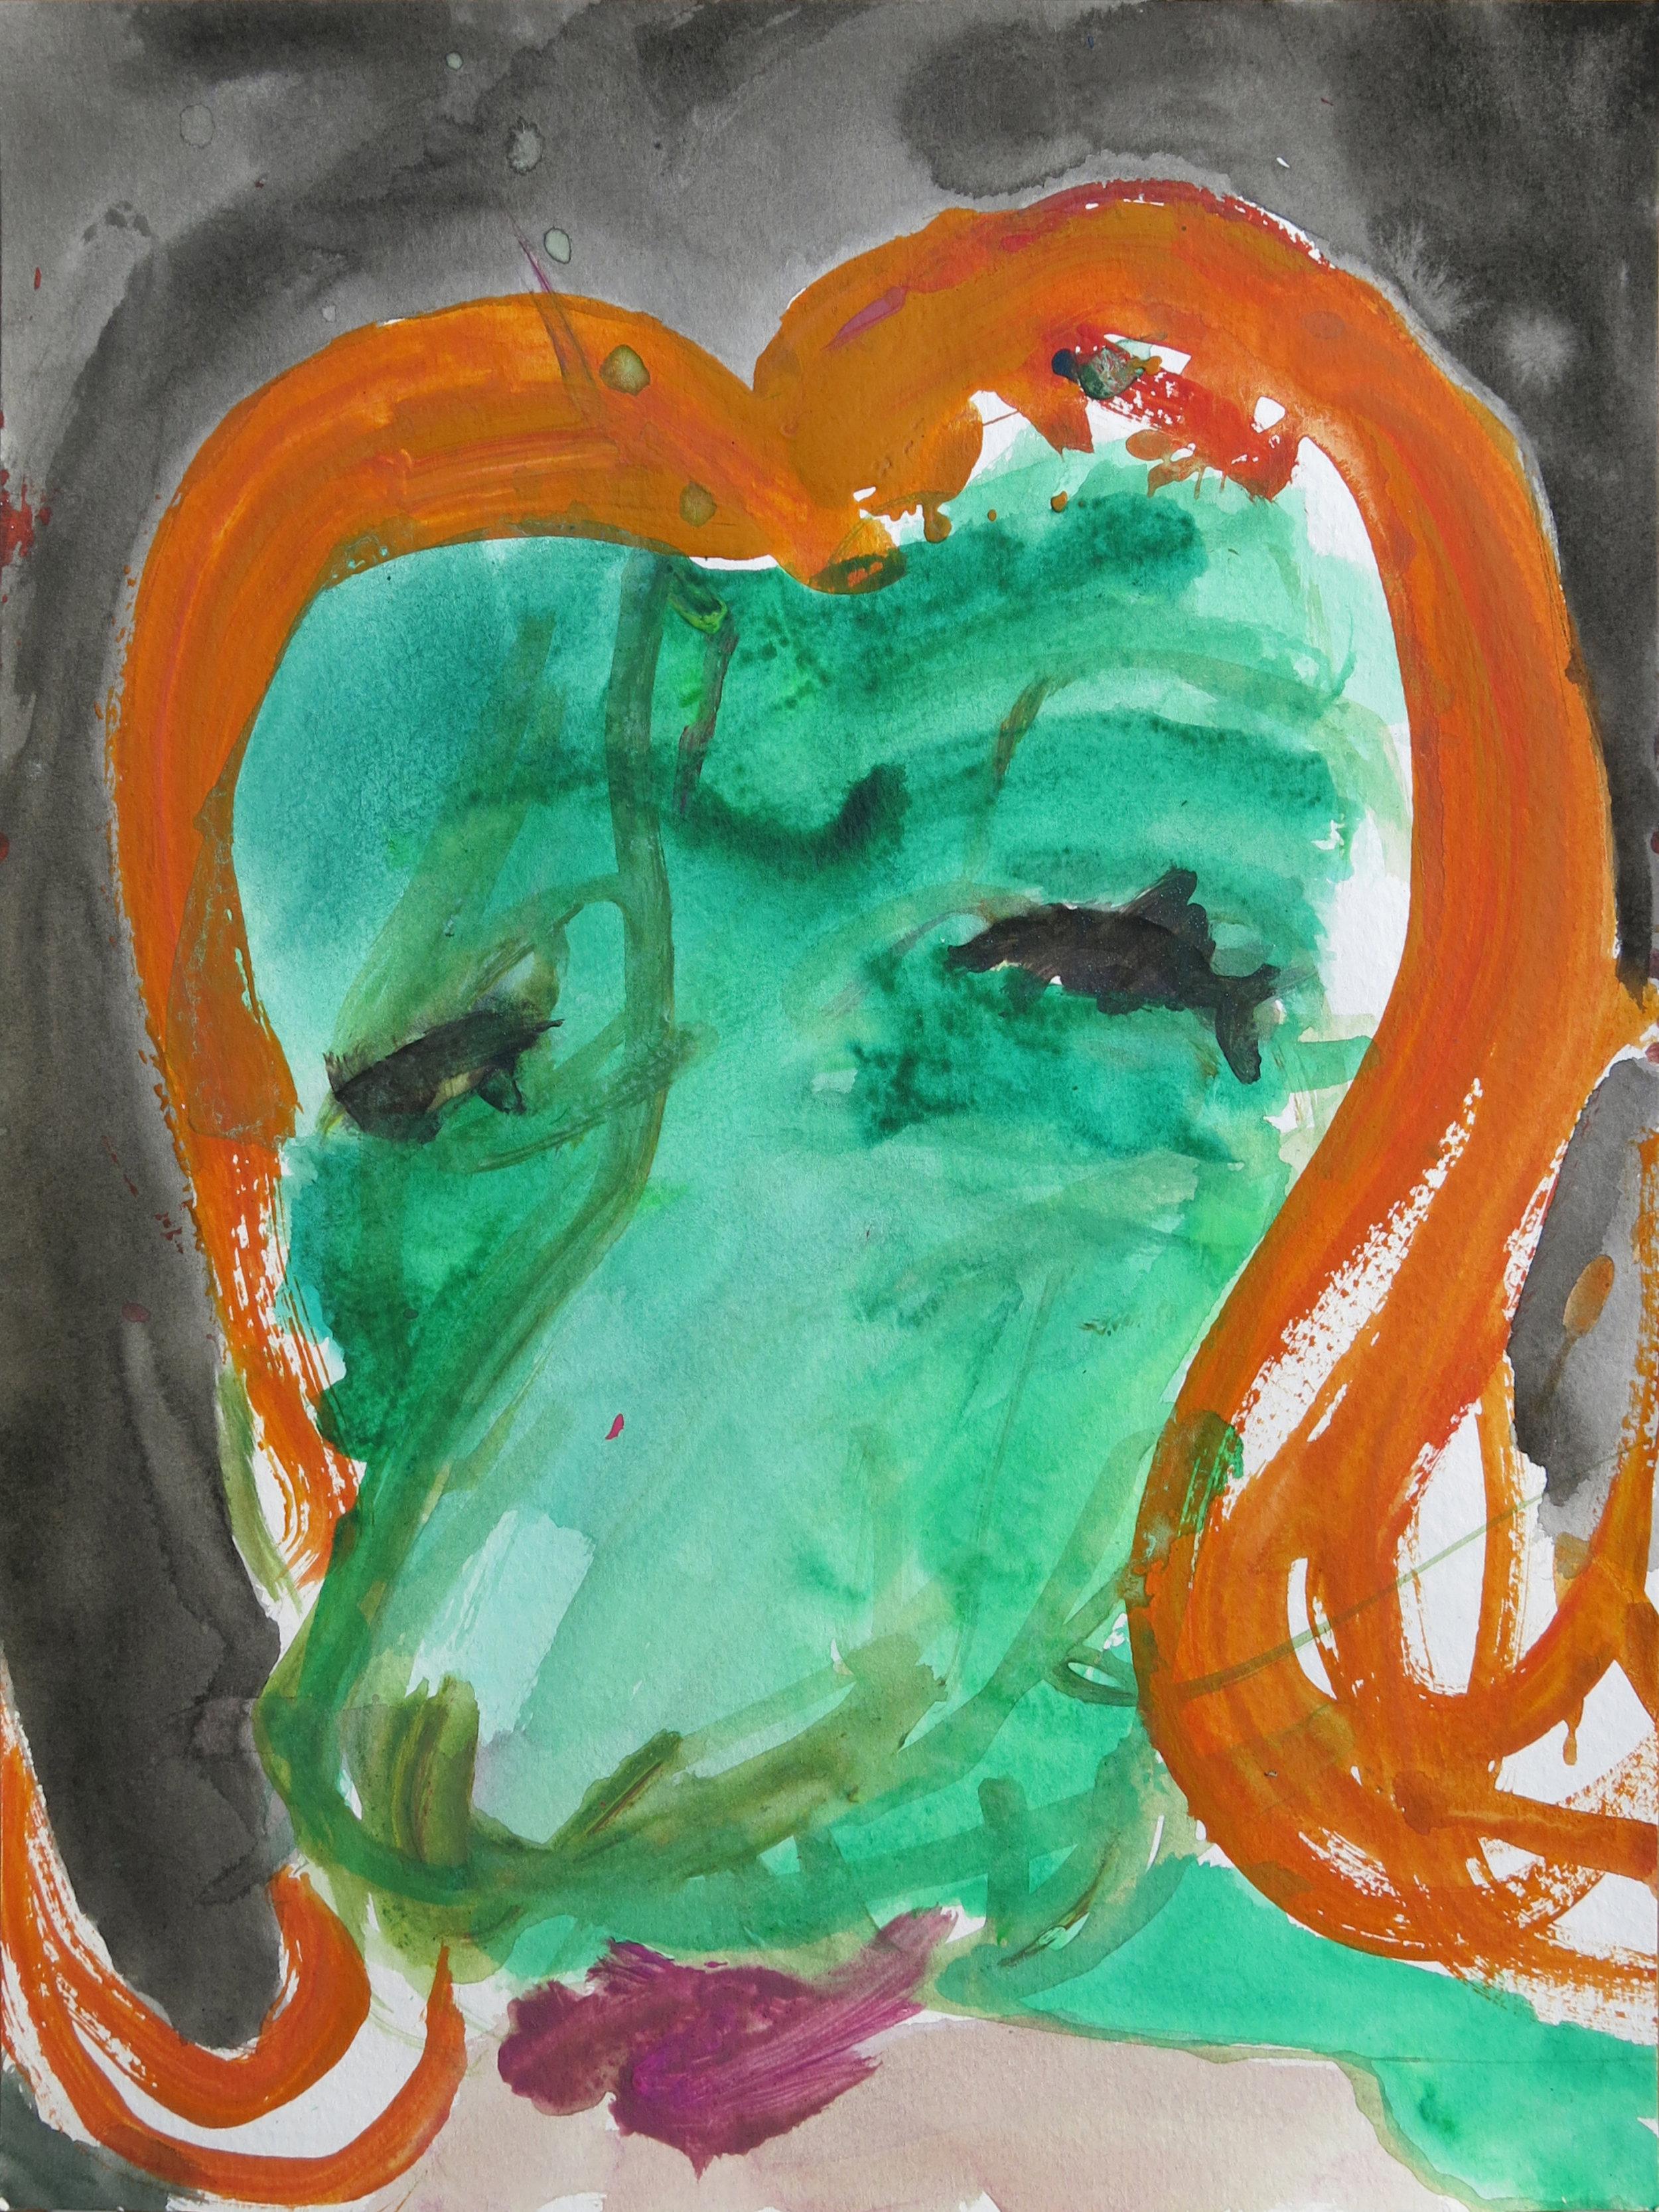 Barbra Streisand Portrait #89